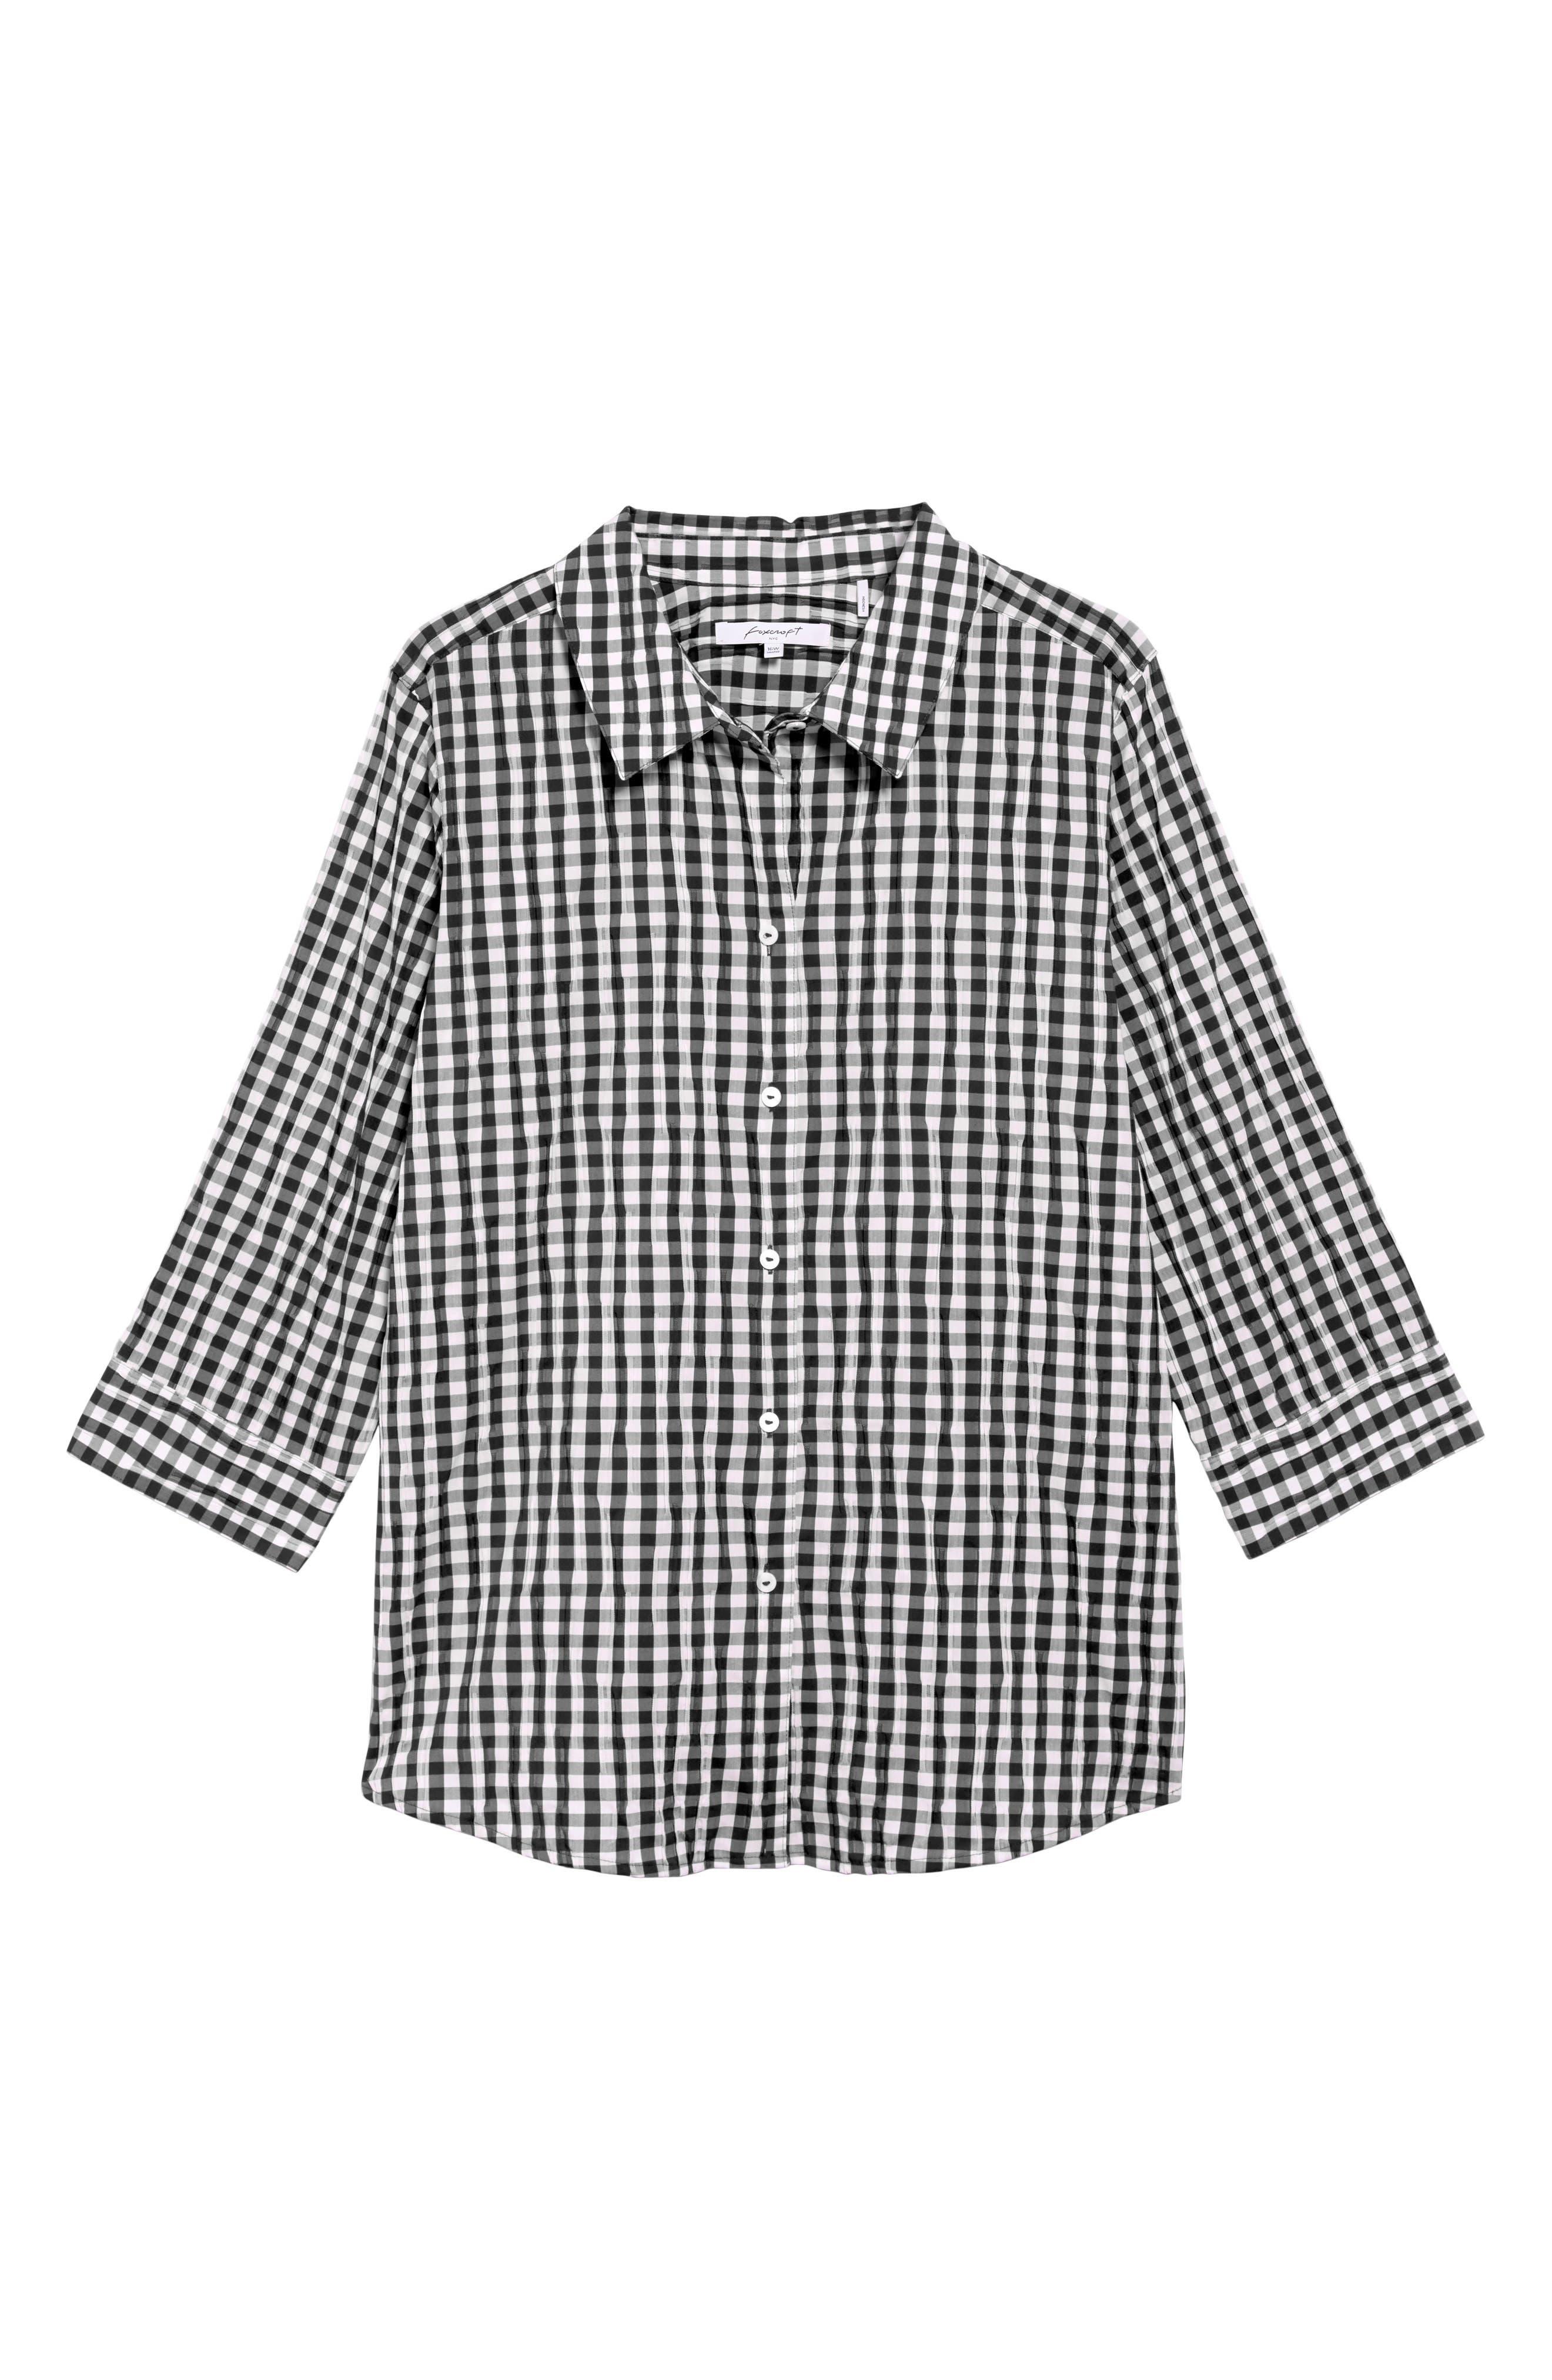 Gingham Shirt,                             Alternate thumbnail 6, color,                             001